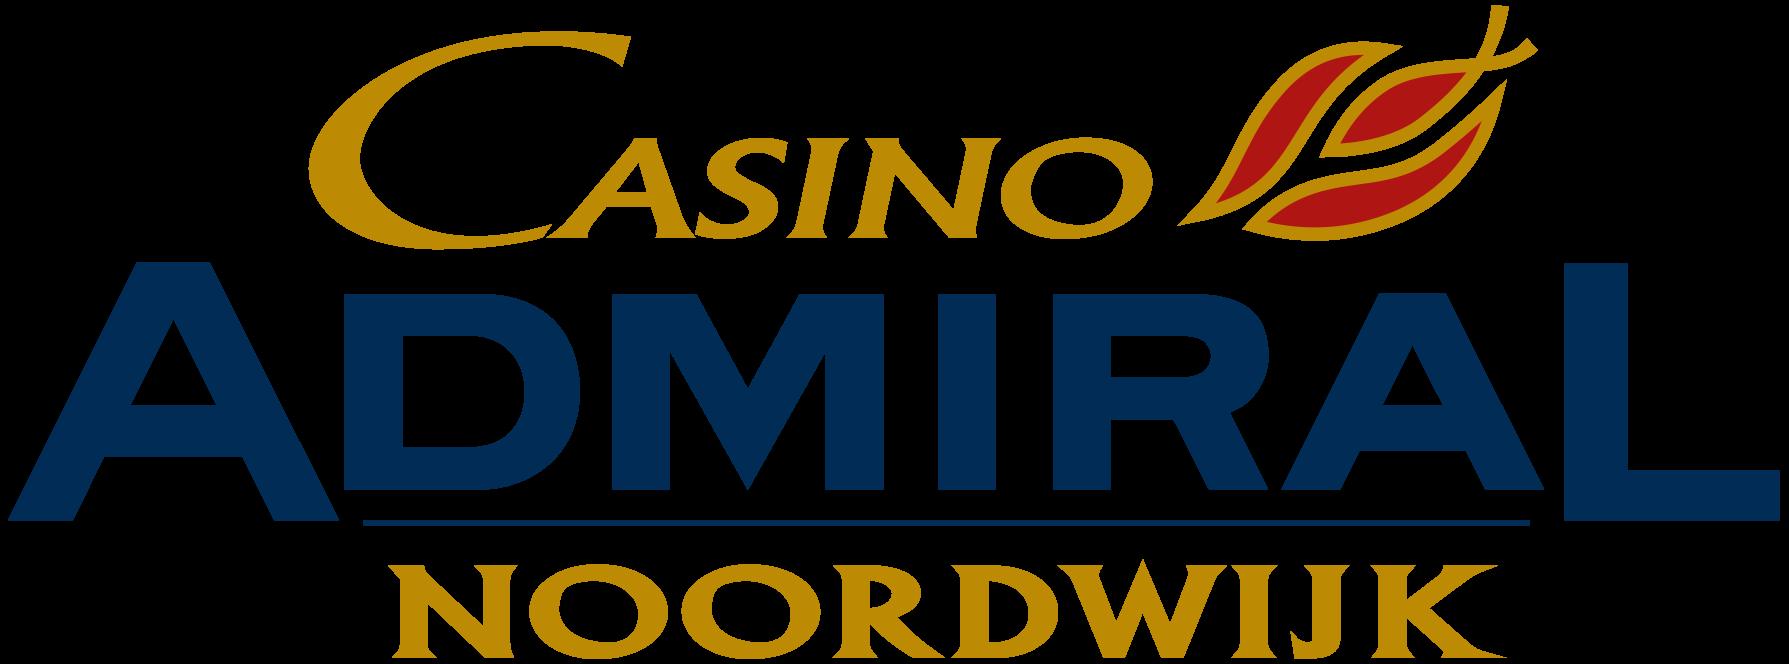 Casino Admiral Gold Club